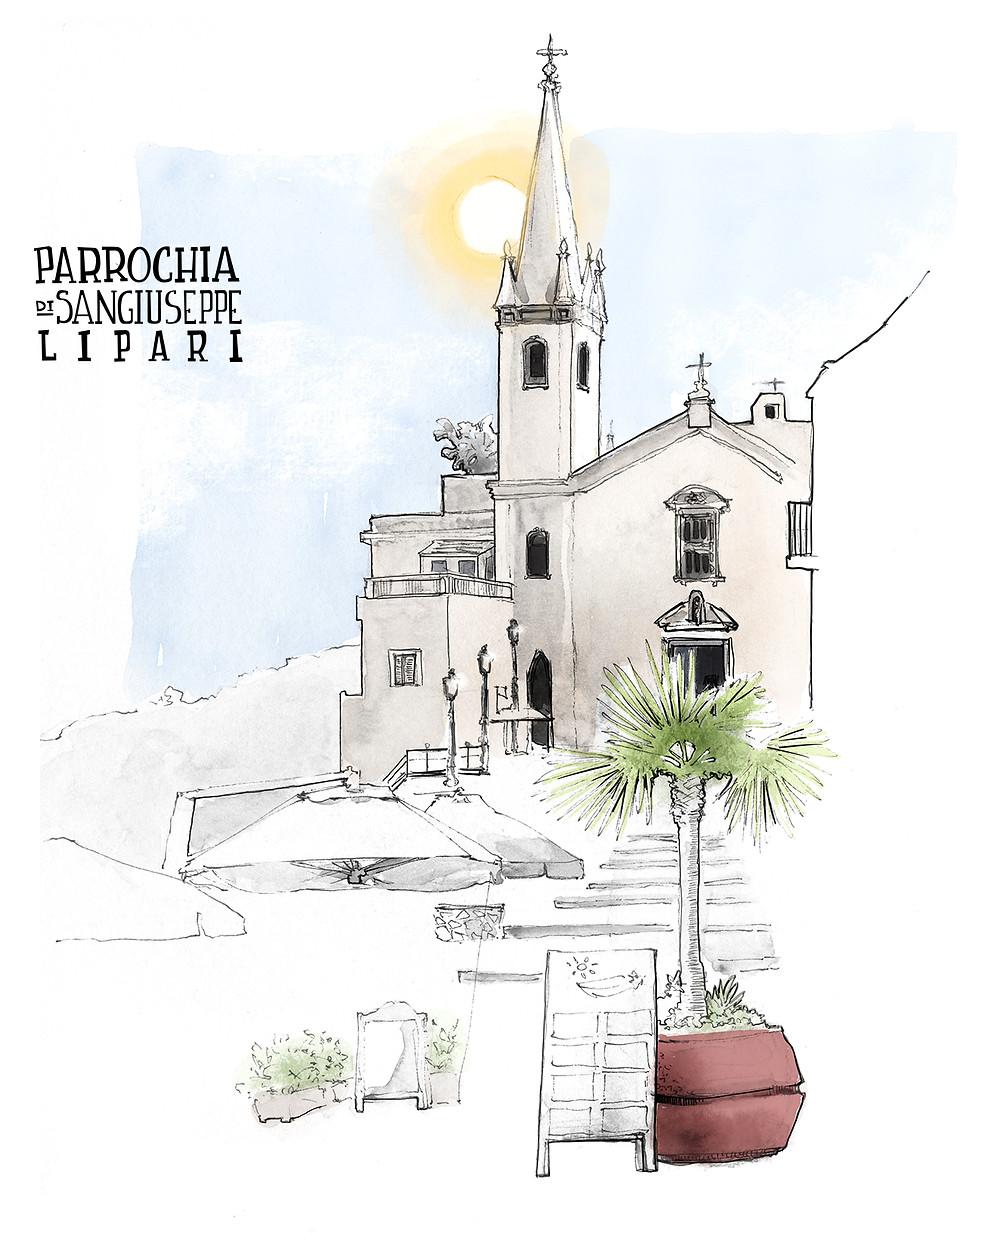 Lipari Drawing Jdan Aeolian Islands Marcellooo Blog Sicily Italy